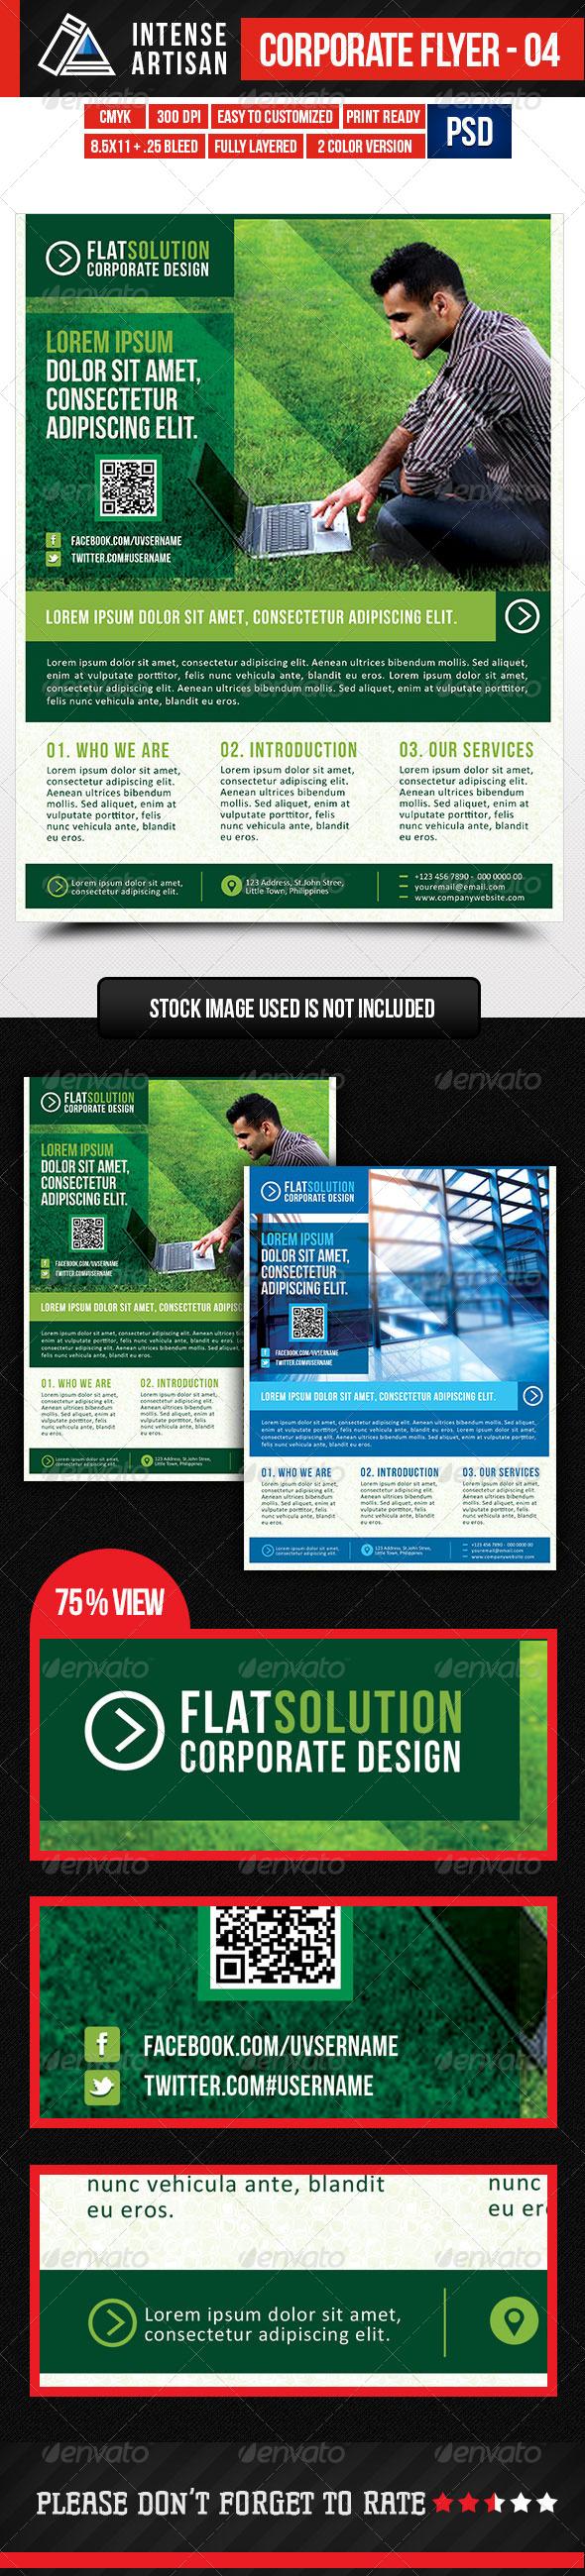 GraphicRiver IntenseArtisan Corporate Creative Flyer Vol.4 5350718